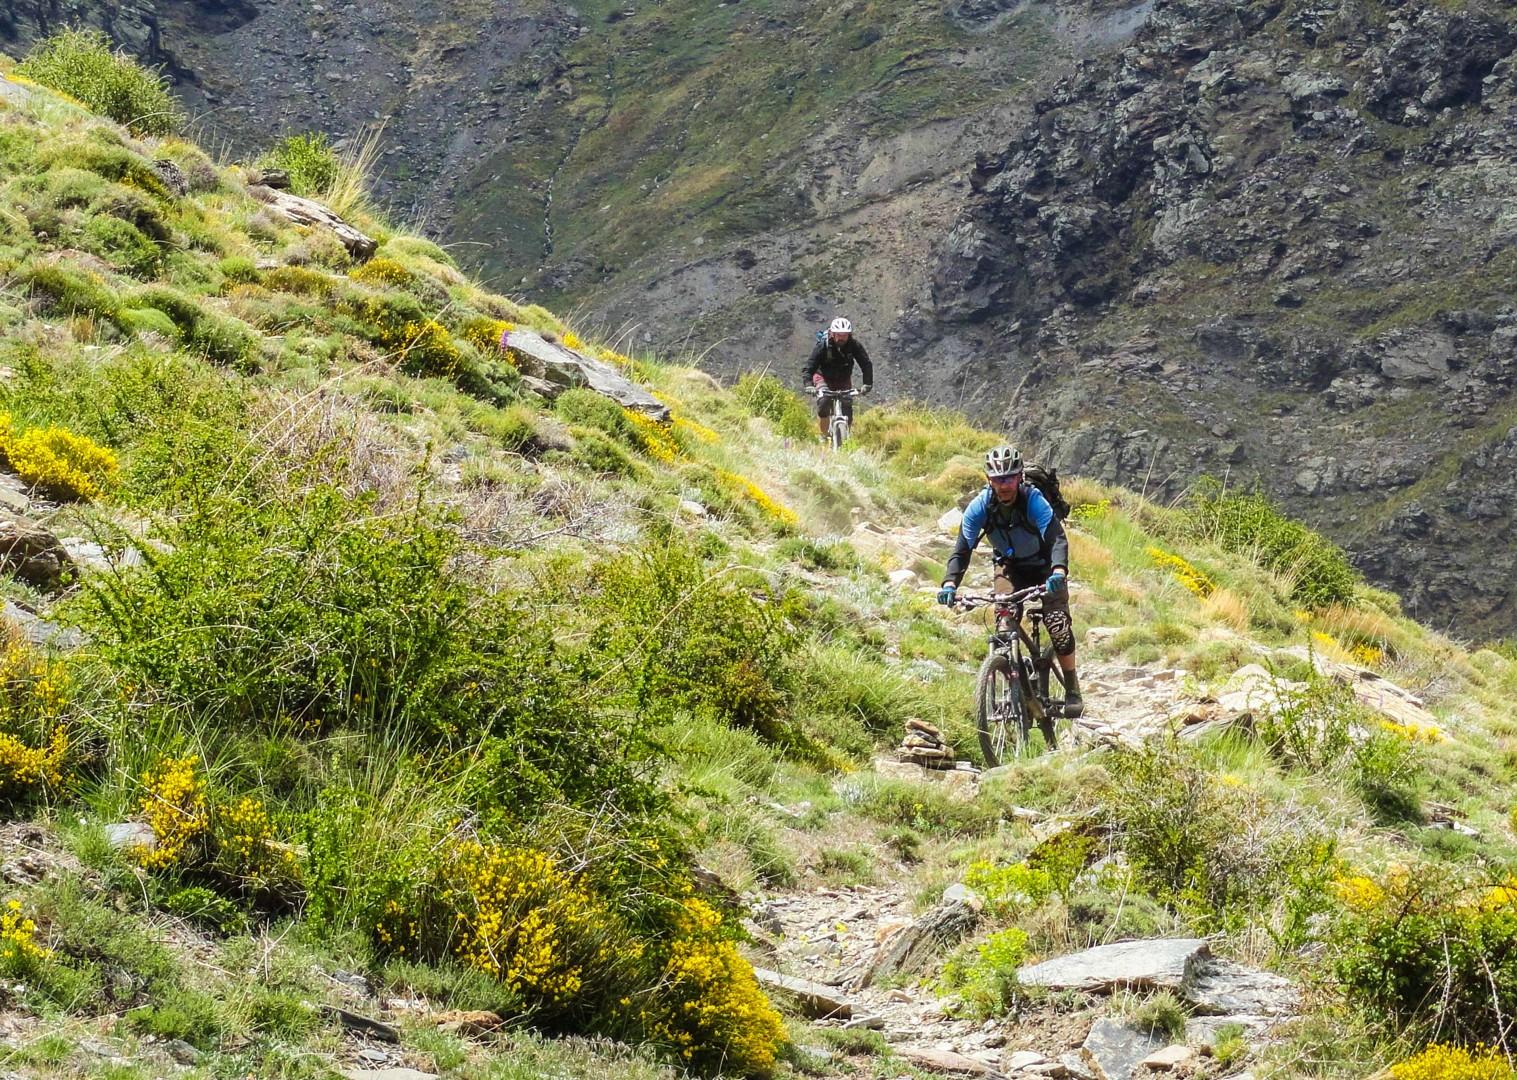 _Holiday.560.19778-2.jpg - Spain - Sensational Sierra Nevada - Electric Mountain Bike Holiday - Mountain Biking